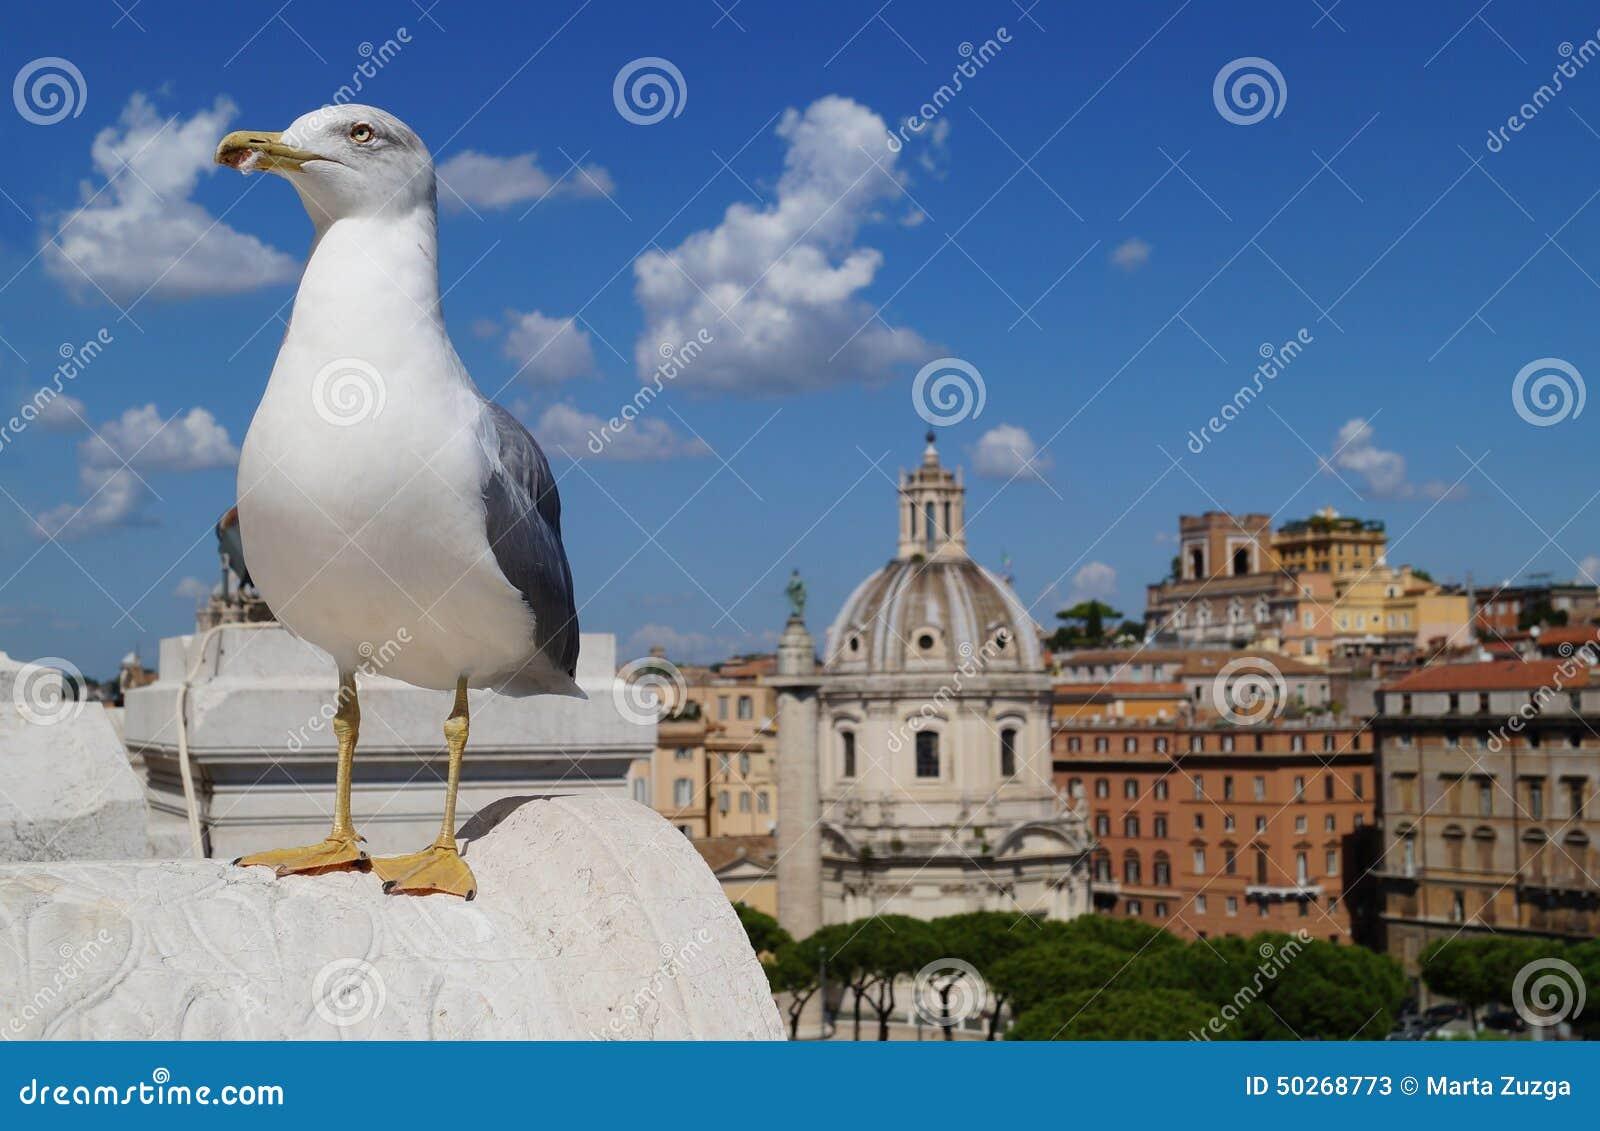 Seagull in Rome.